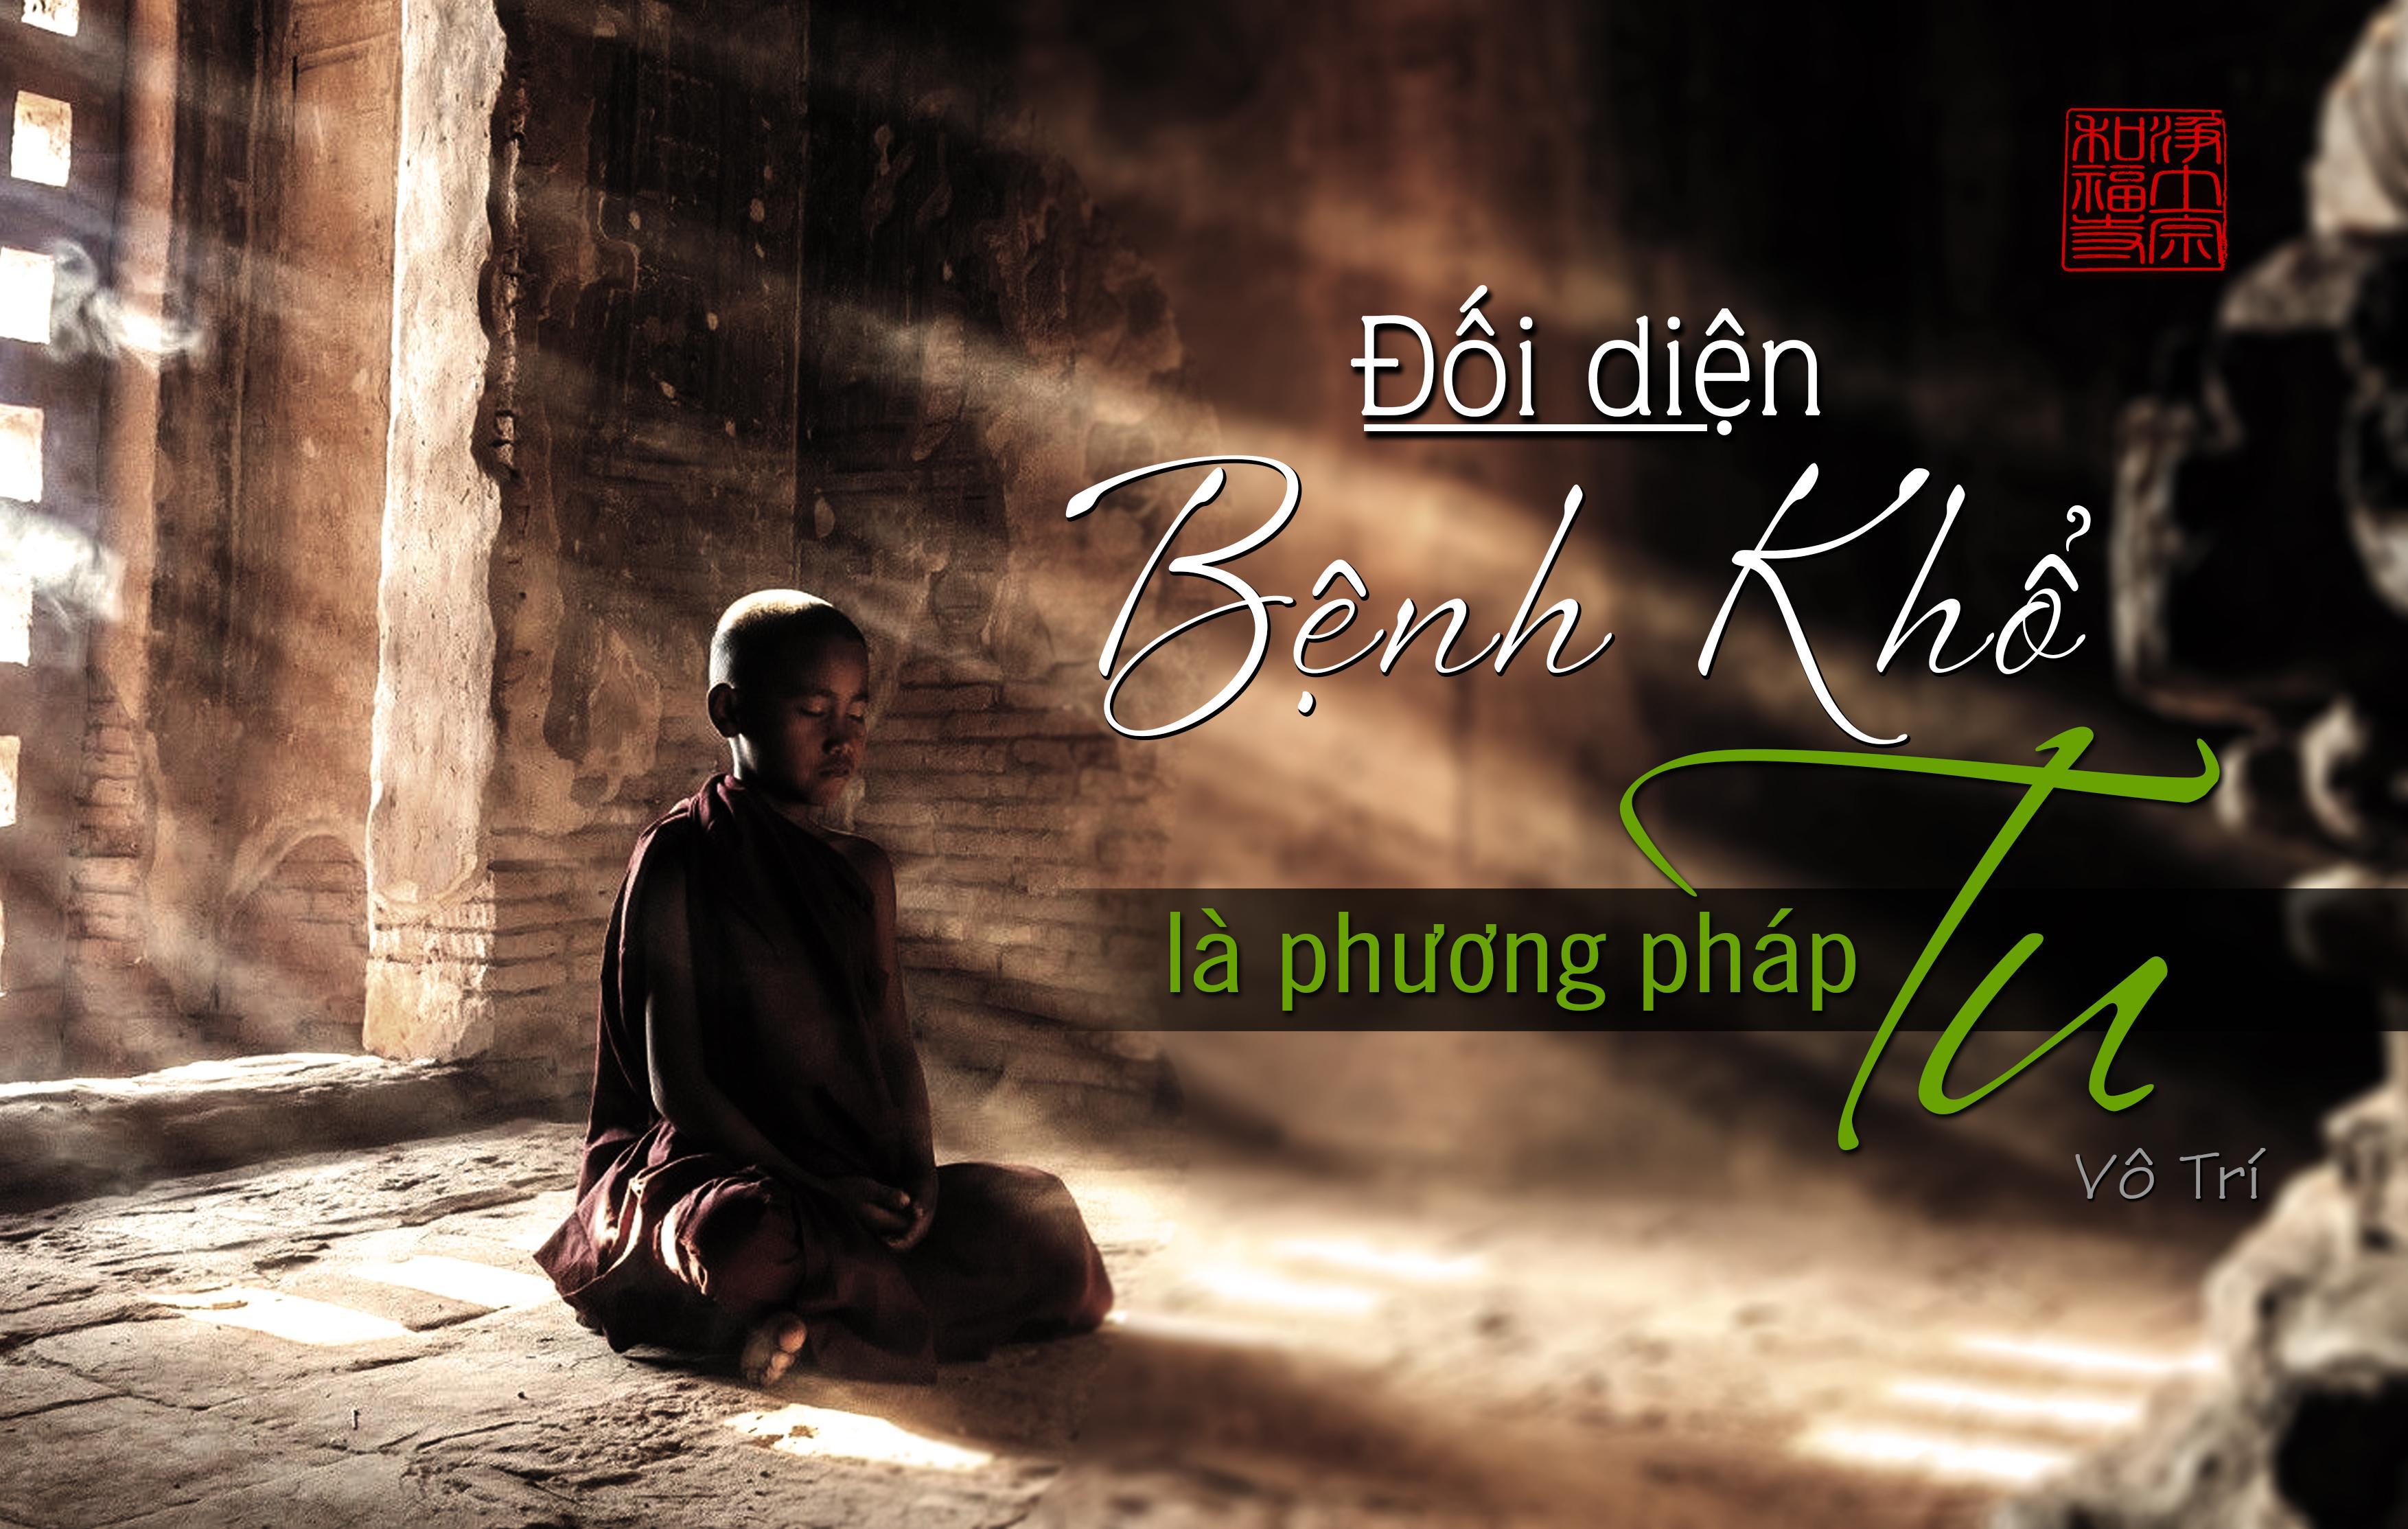 doi_dien_benh_kho_la_phuong_phap_tu4.jpg